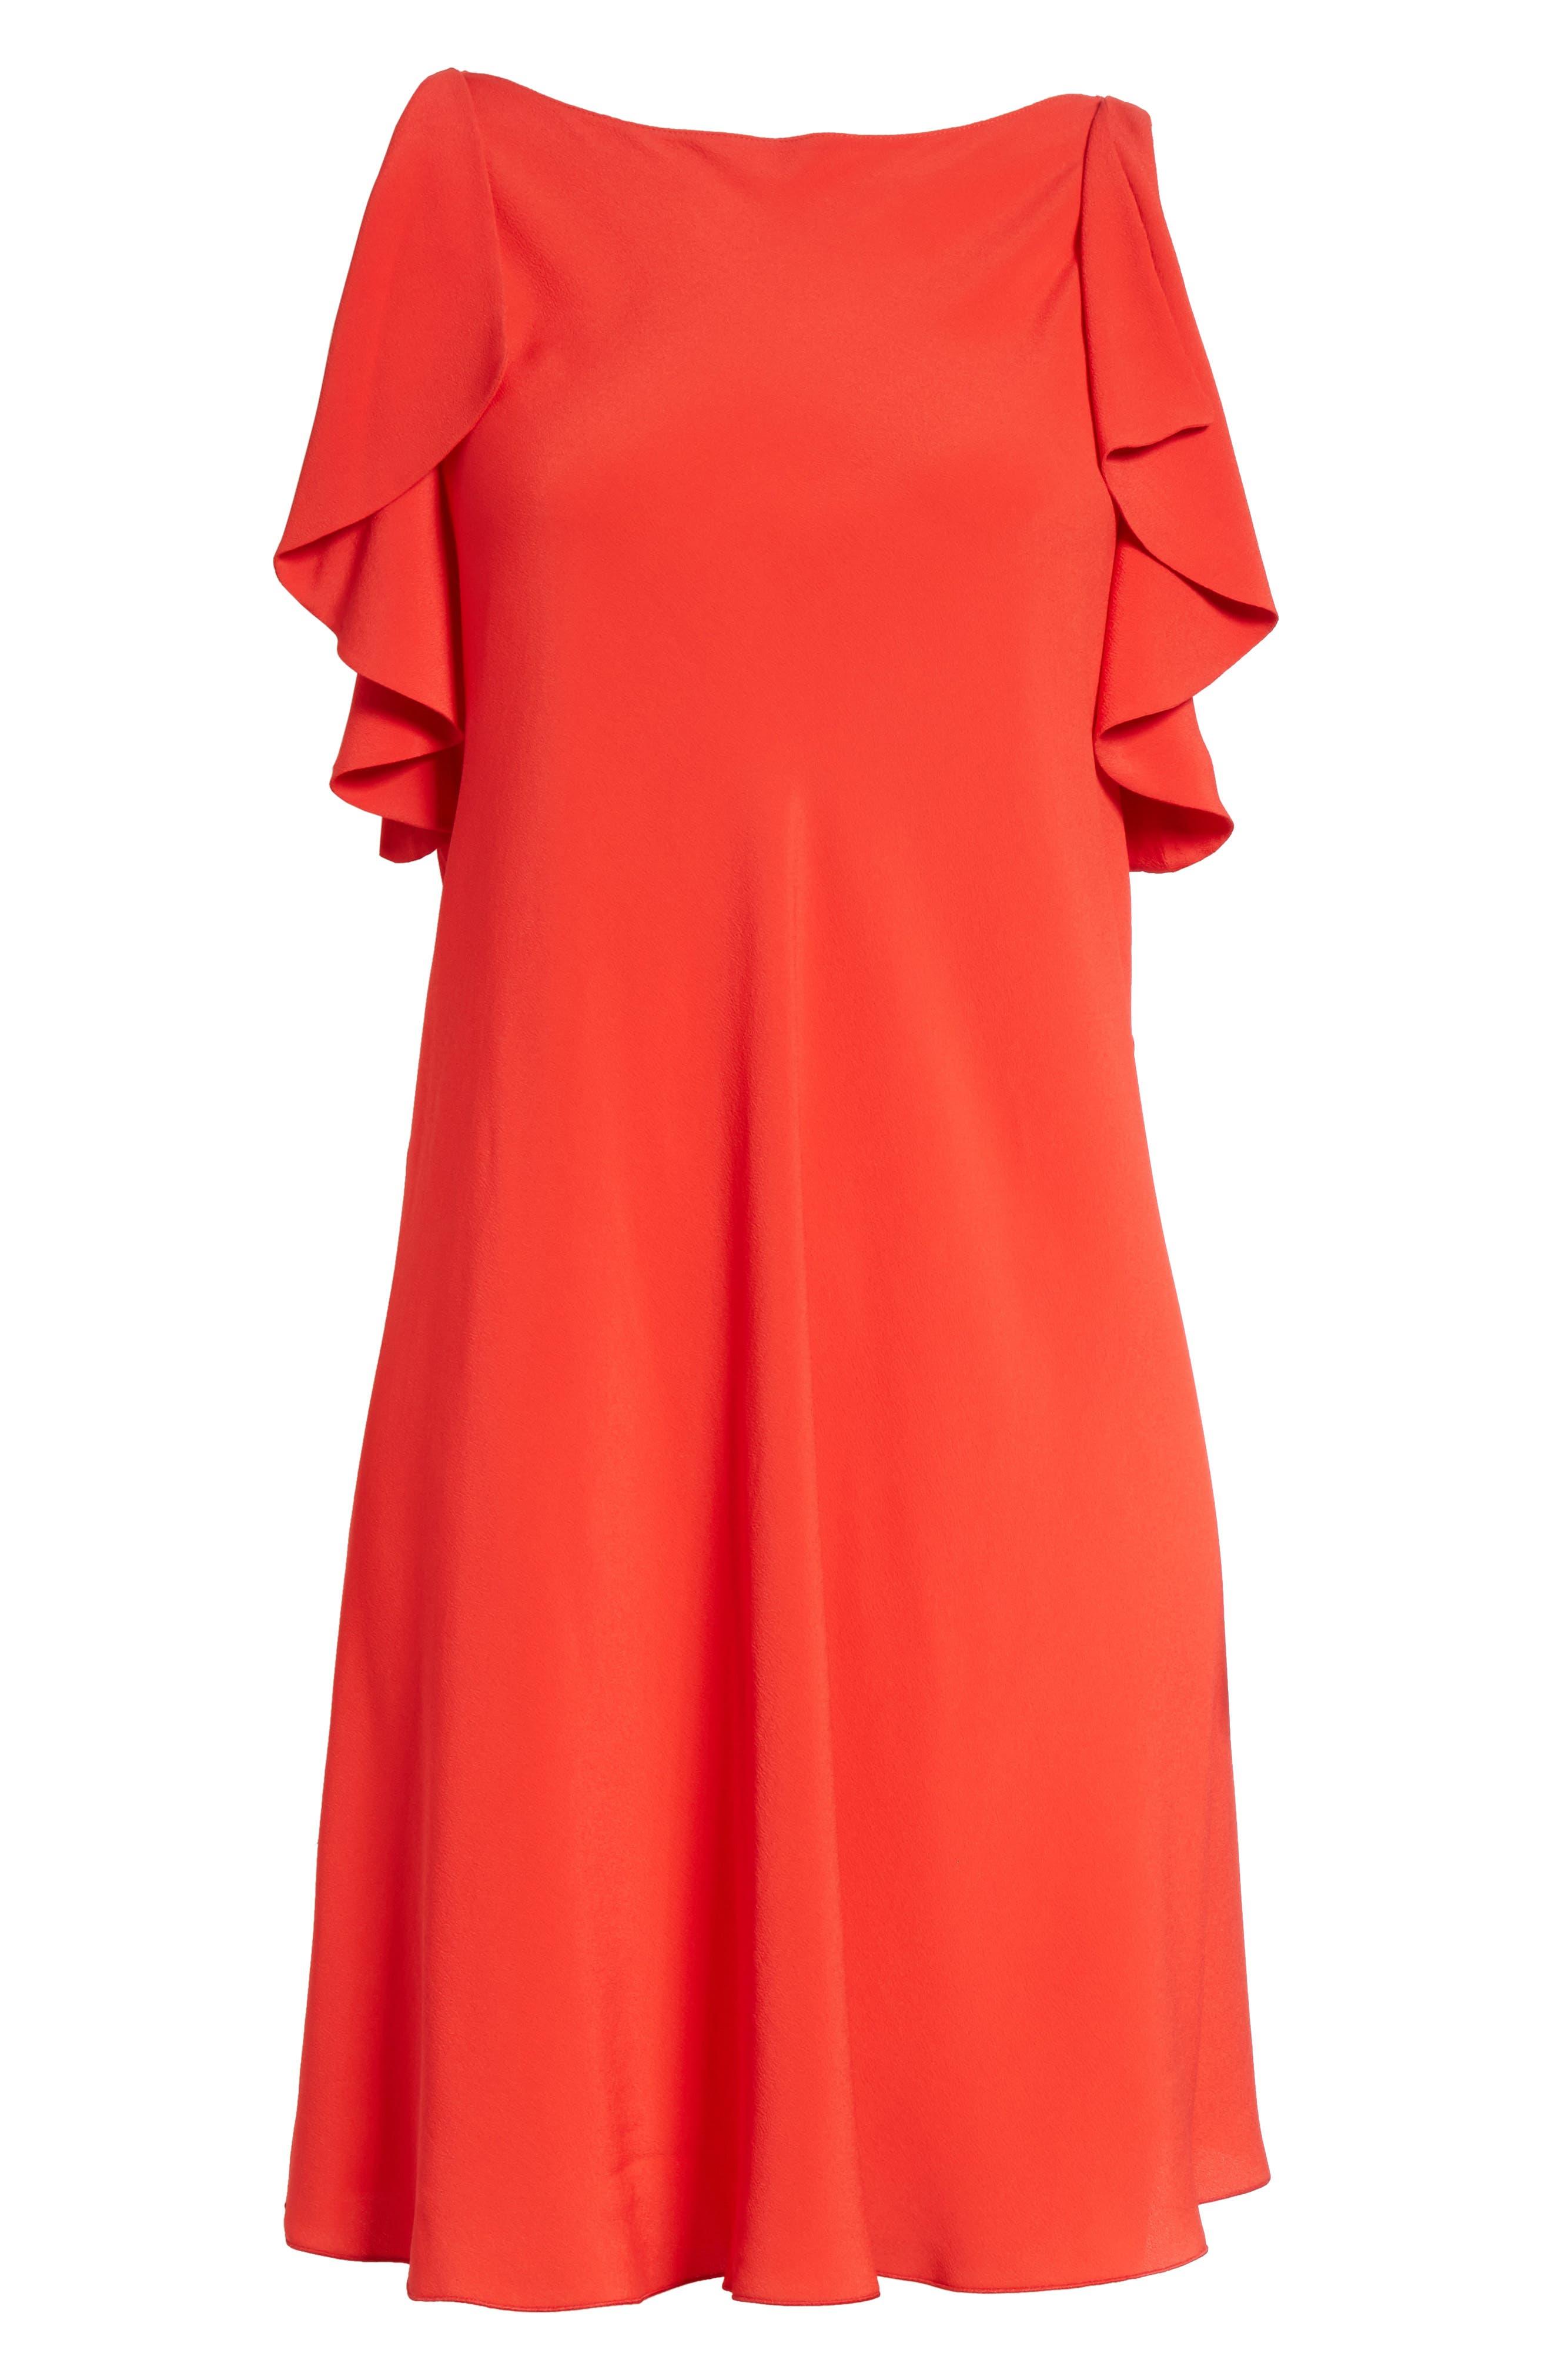 Ruffle Trim A-Line Dress,                             Alternate thumbnail 6, color,                             Red